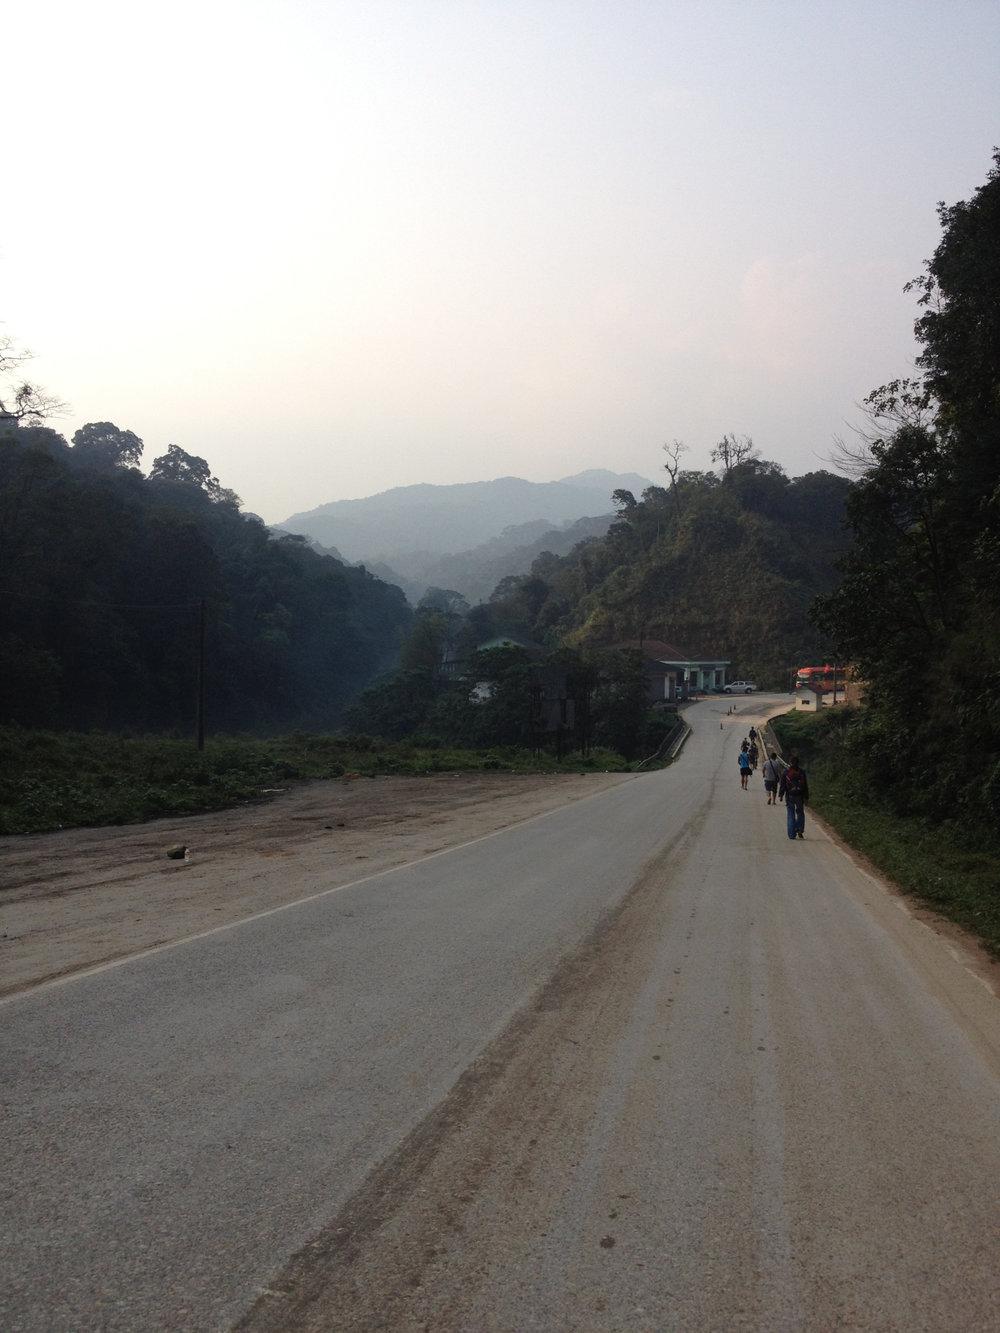 Border crossing from Vietnam to Laos